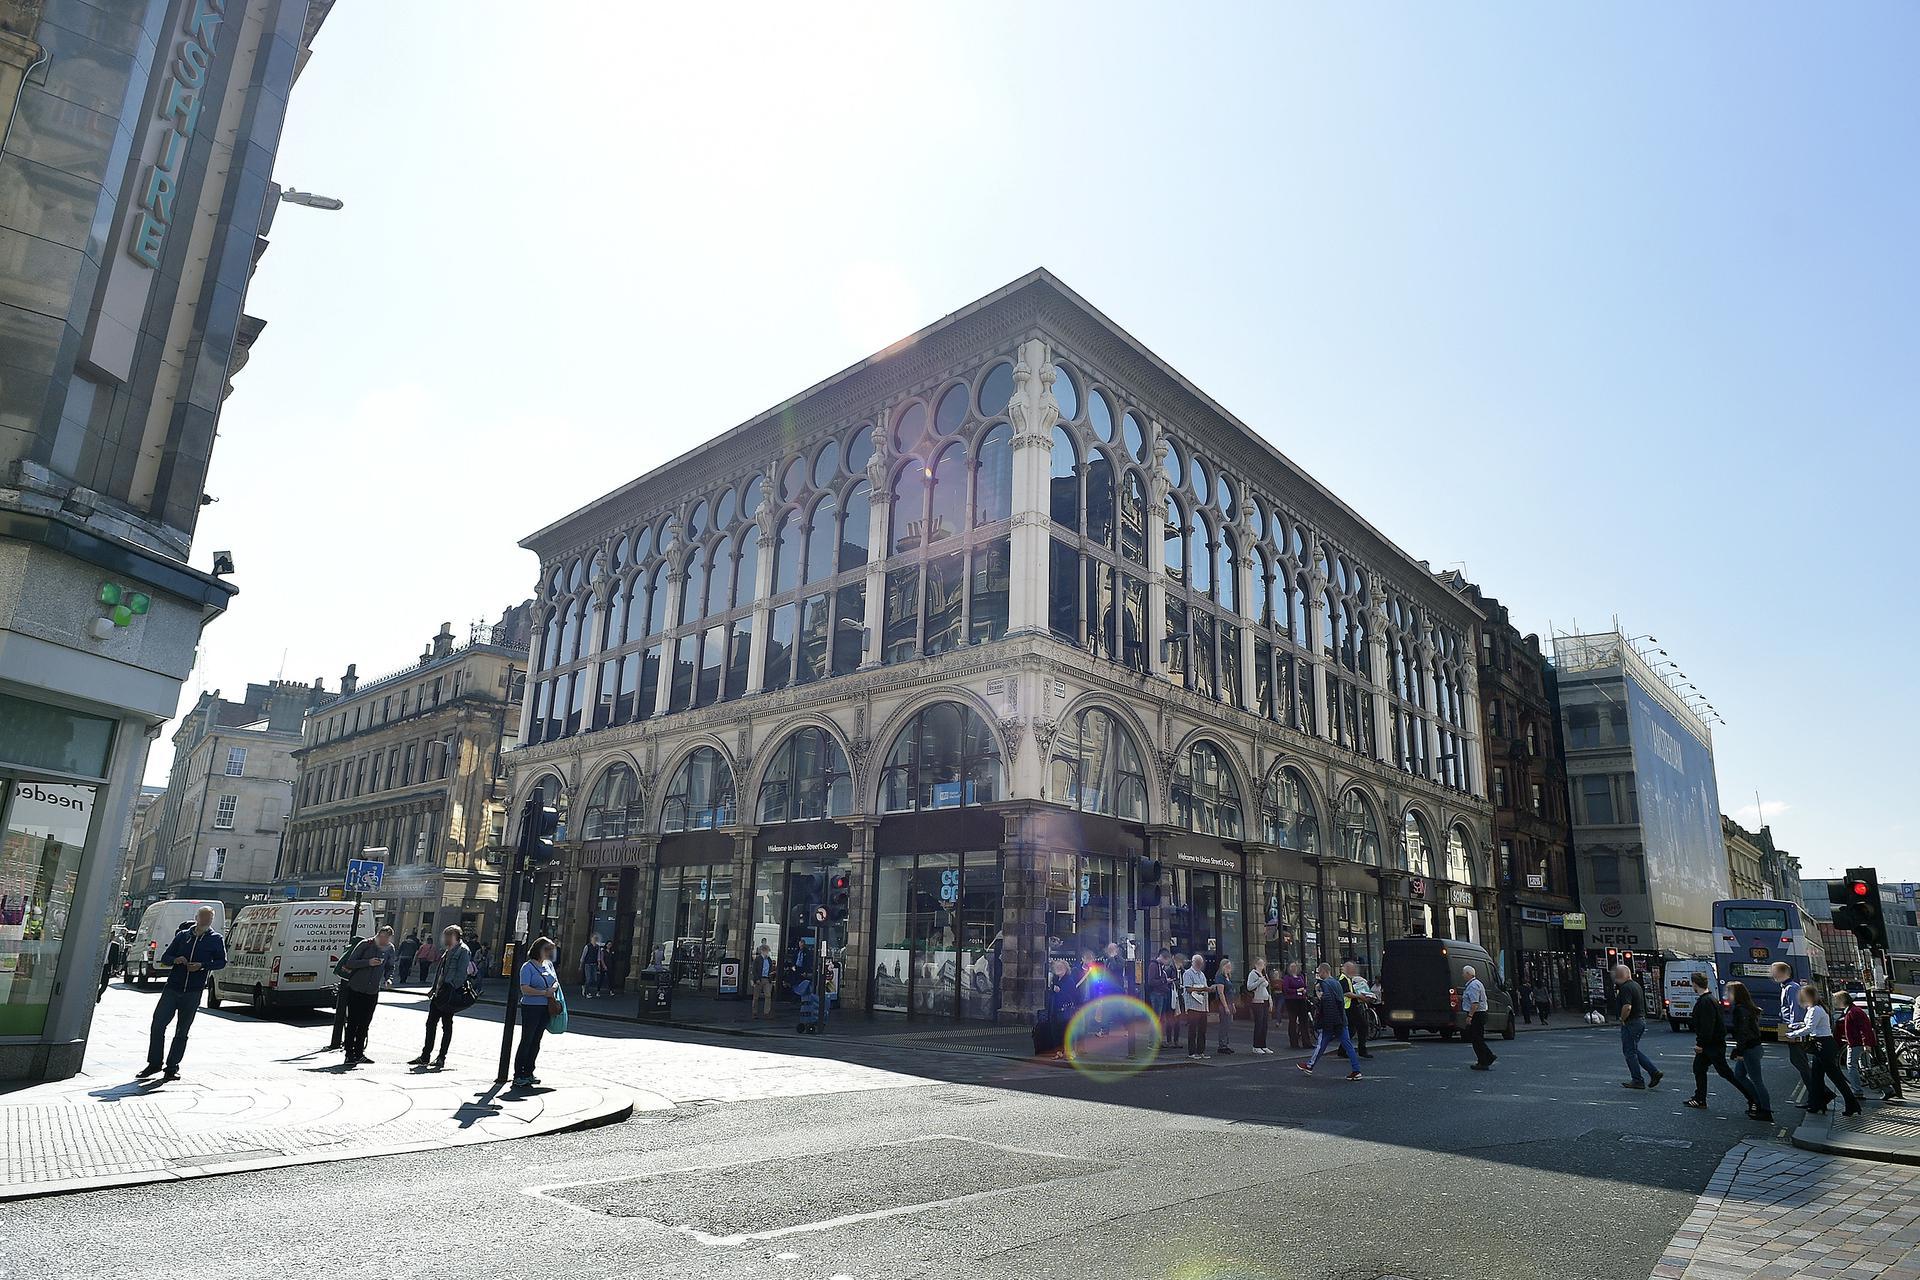 A photograph of Glasgow - Union Street